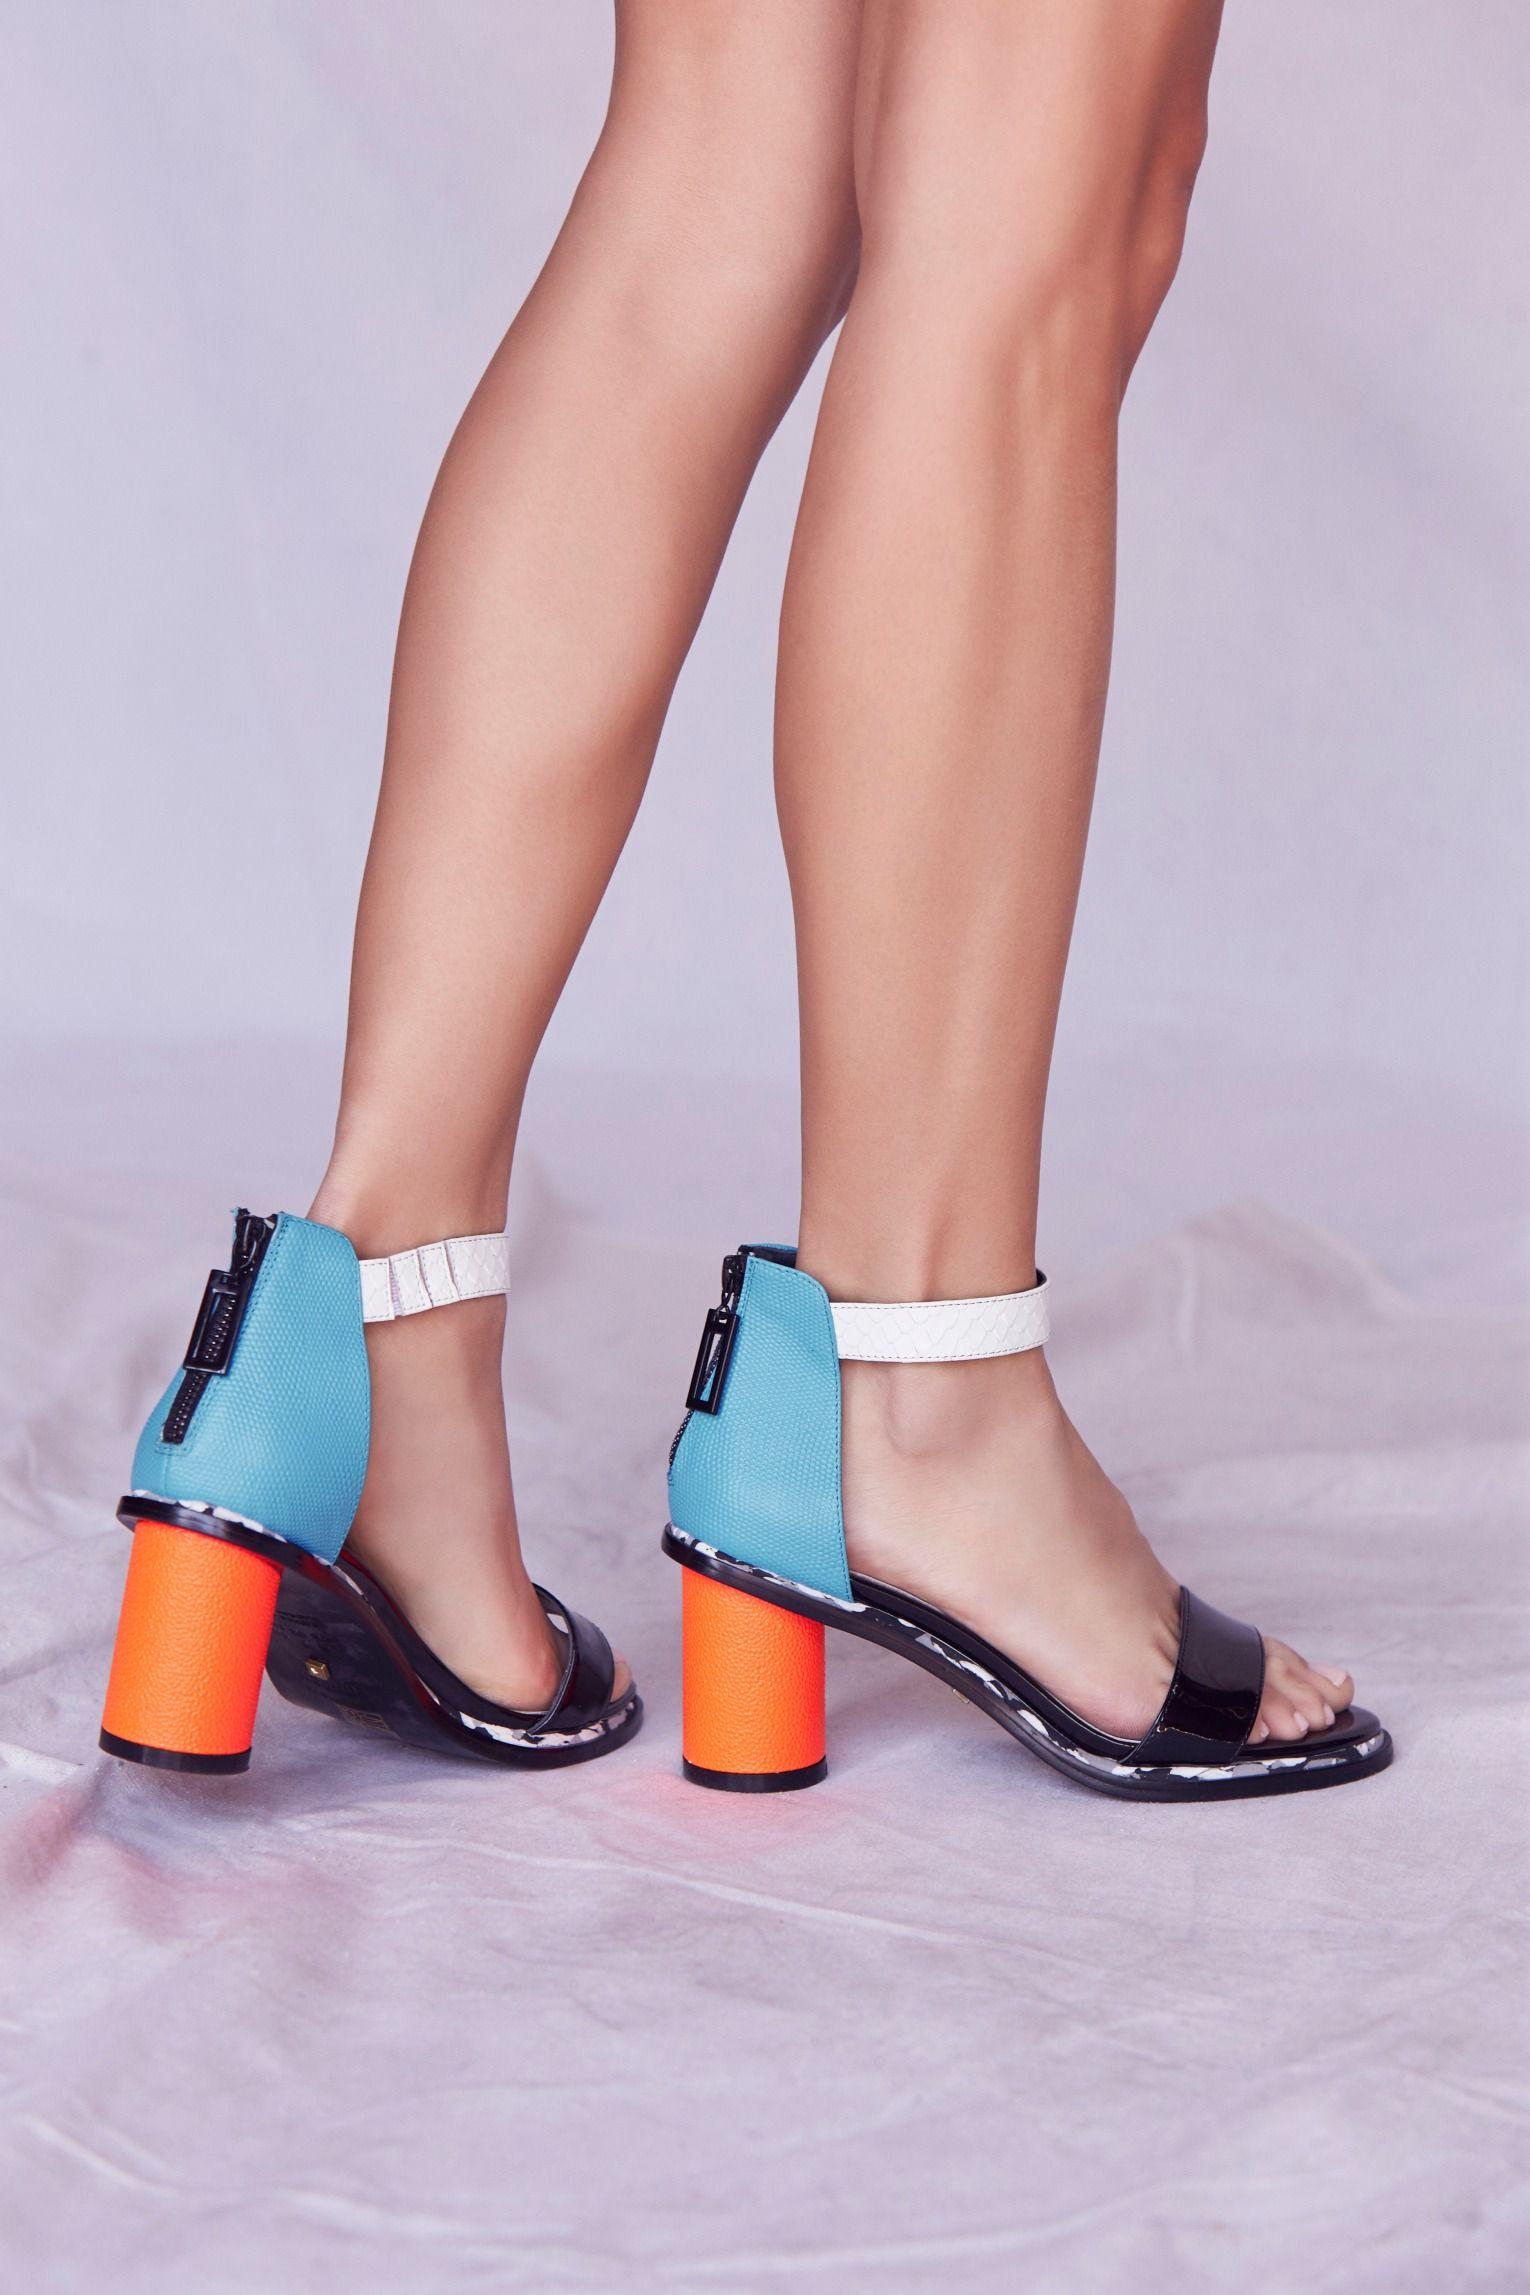 ff67b89ef6 Looks We Love: Island Bohemian | Shoes